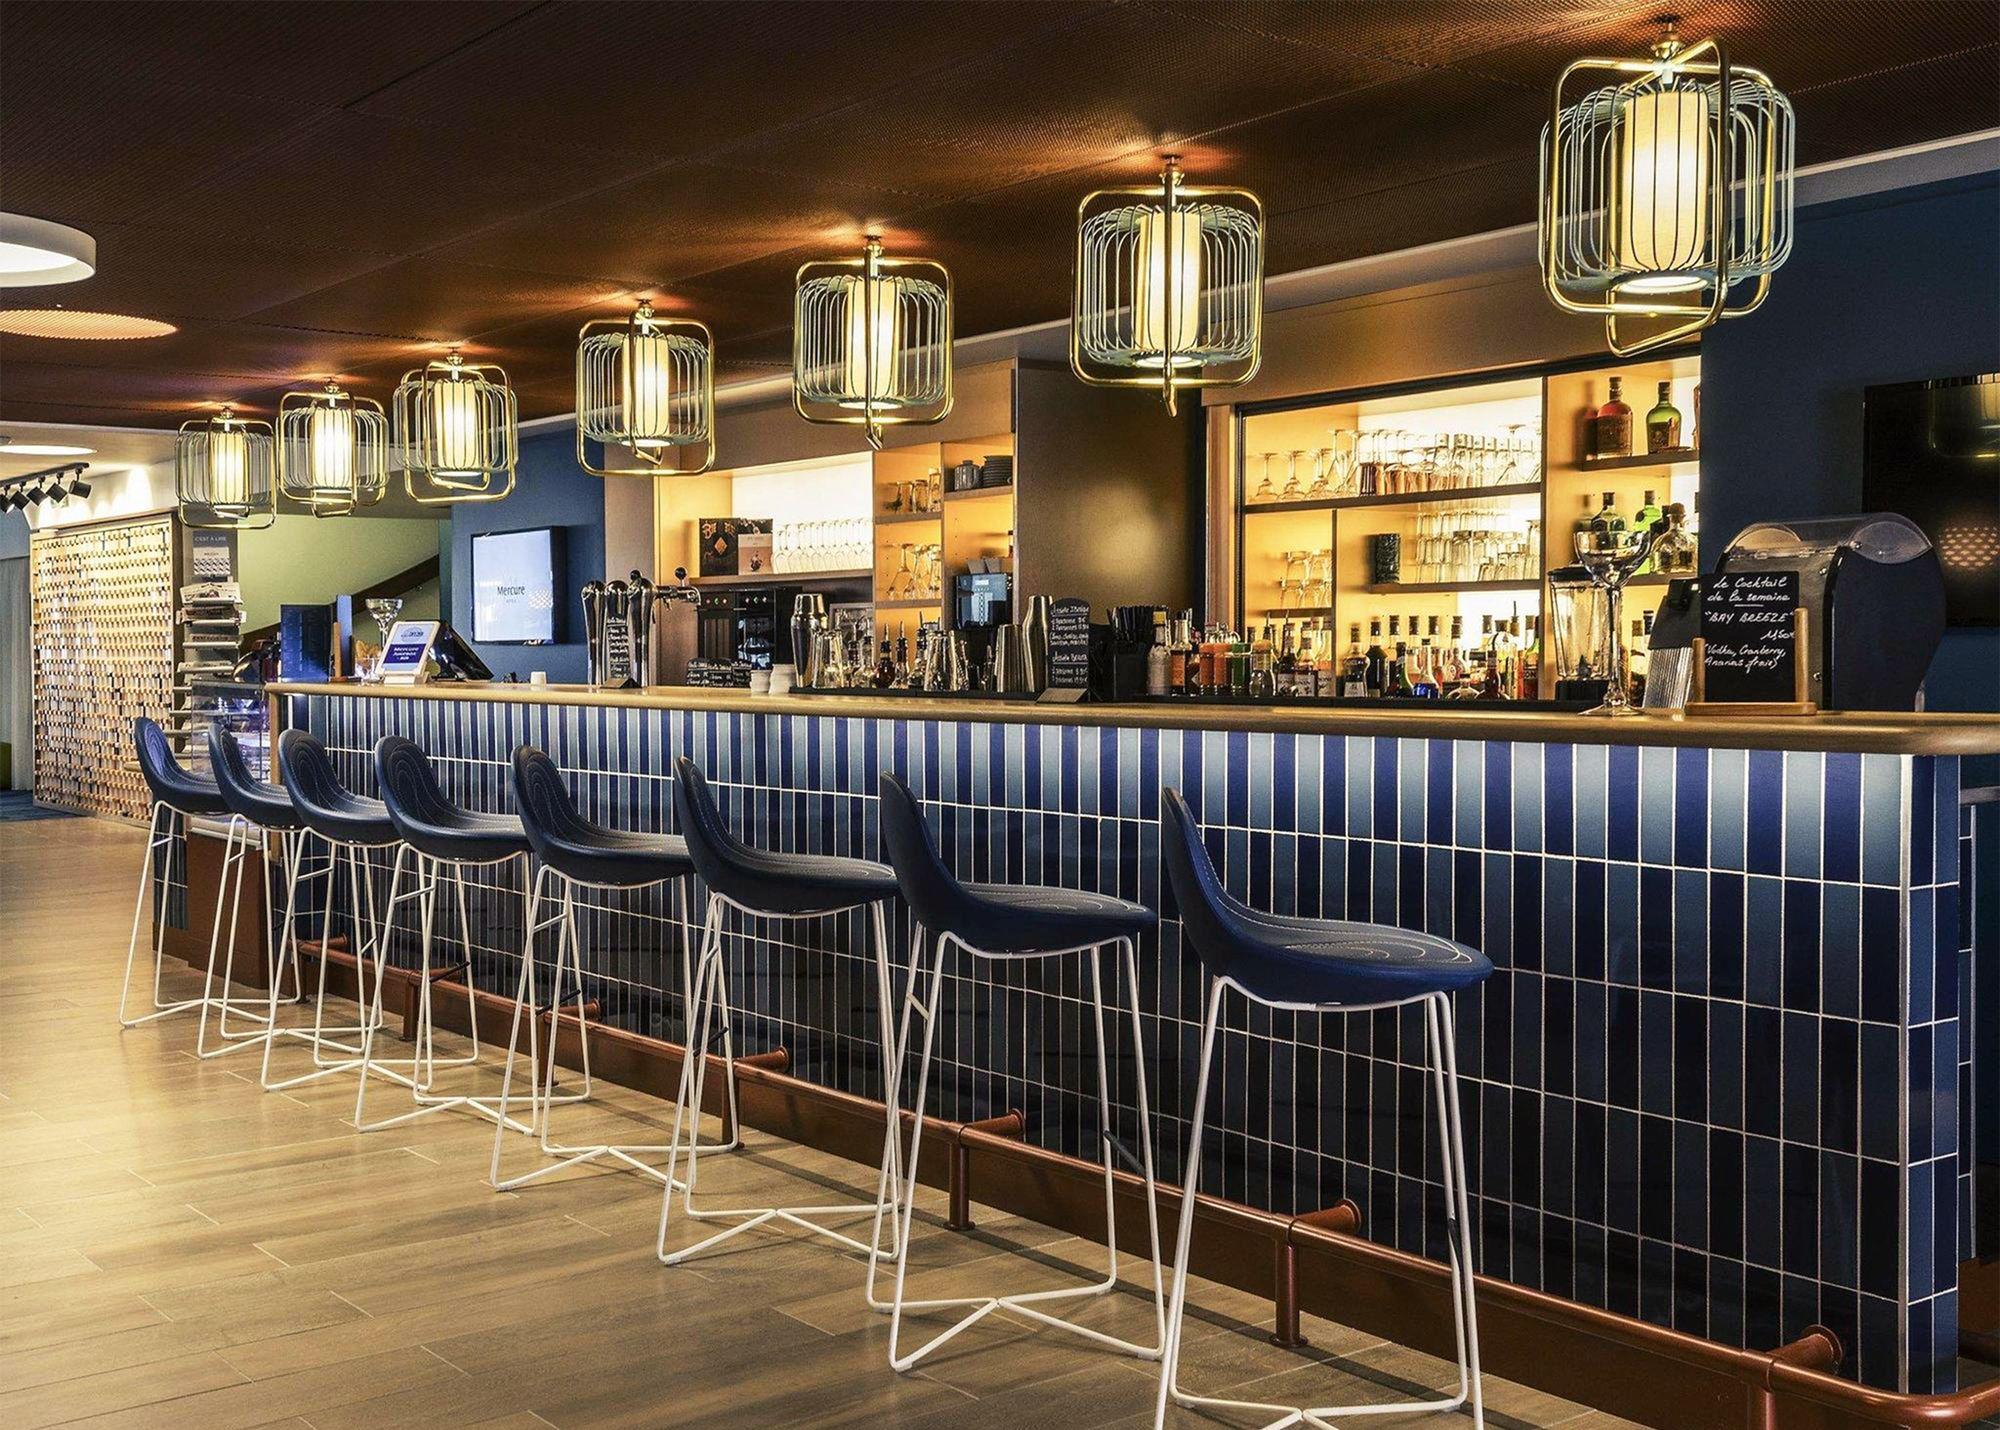 Jules Iii Suspension Lamps Mercure Hotel Utu Soulful Lighting Www Utulamps Com Interi Design D Interieur Du Bar Bar Restaurant Design Decoration Design